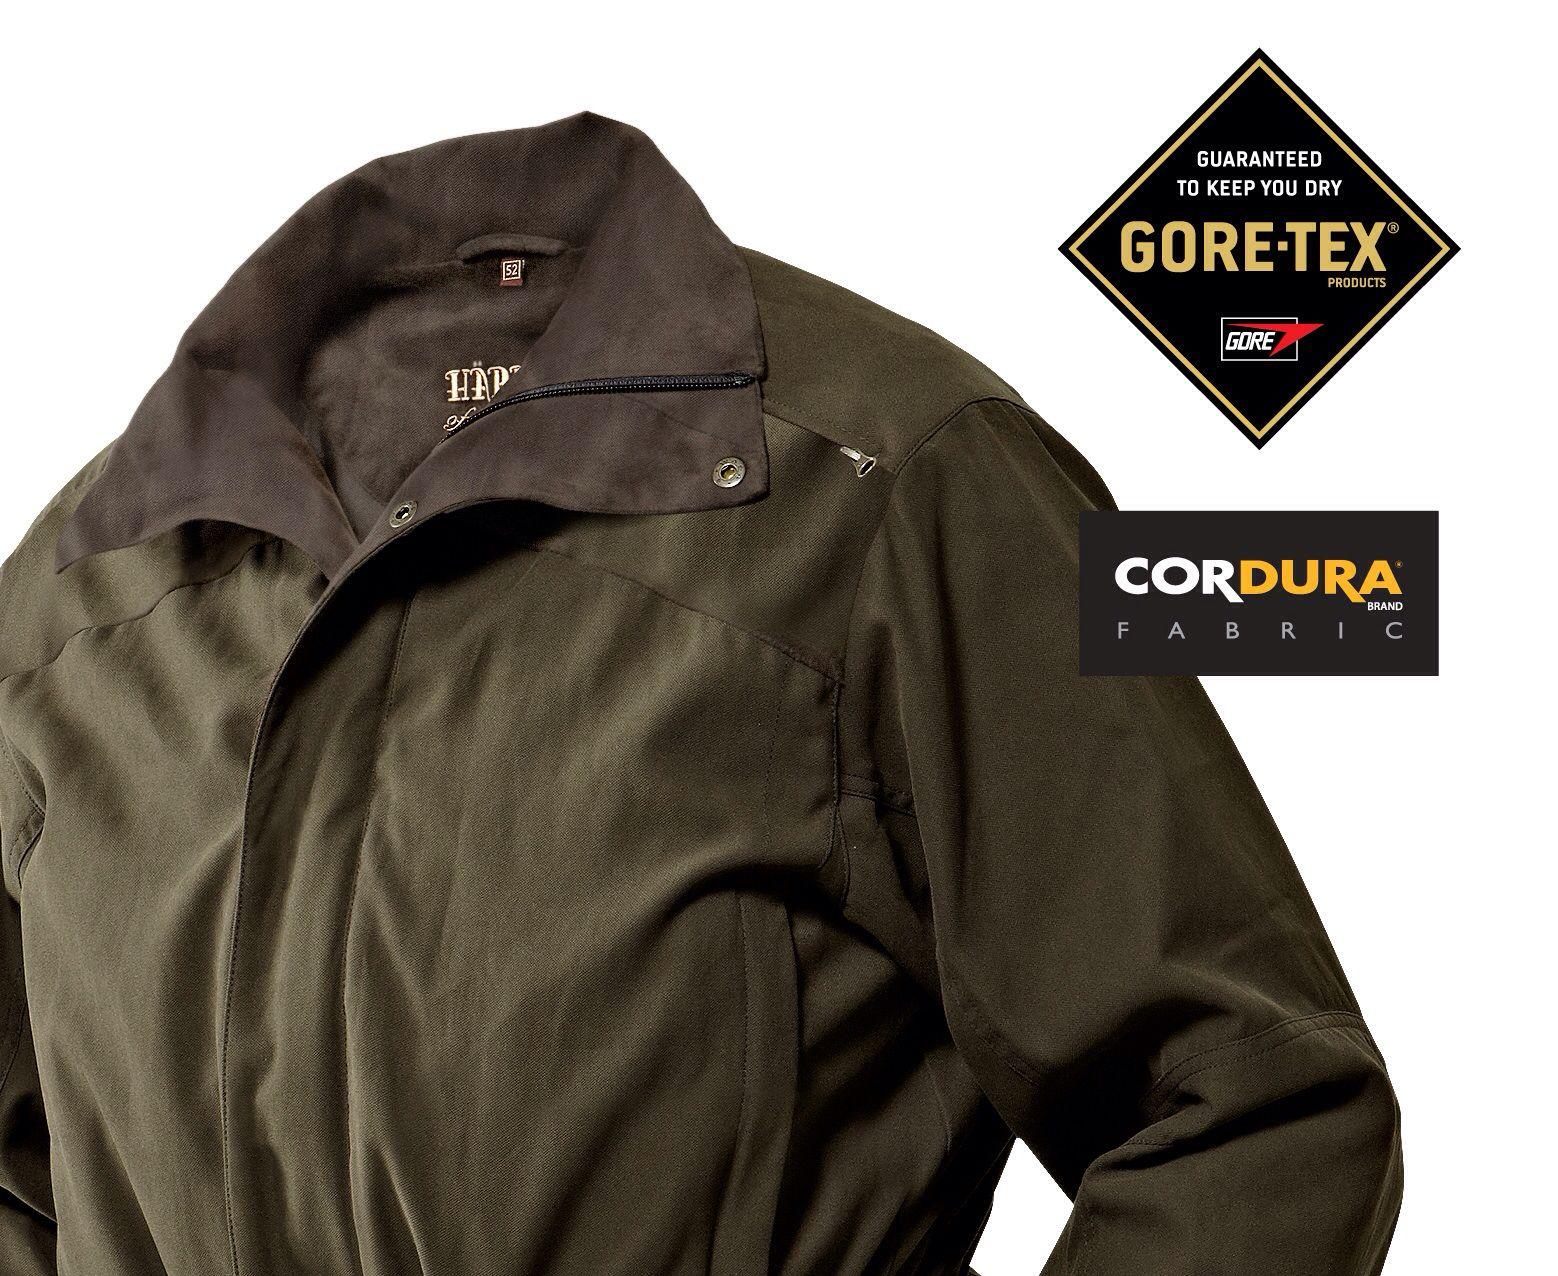 9c414937b1880 Harkila Canis gore-tex shooting jacket, lightweight | MENS CLOTHING ...